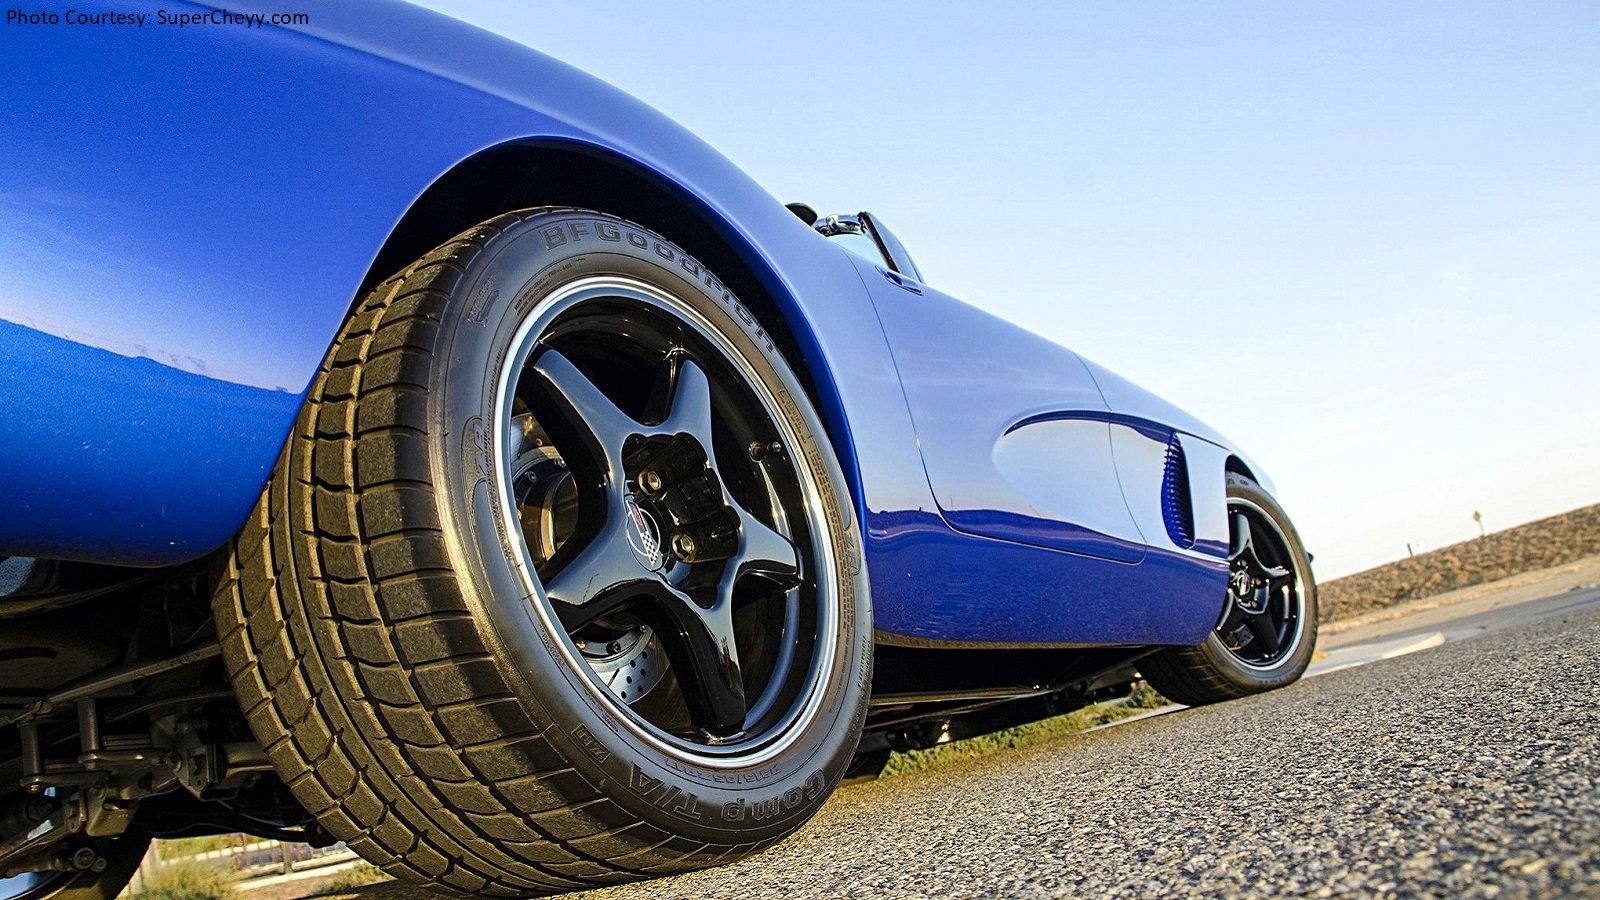 1962 Corvette Grand Sport